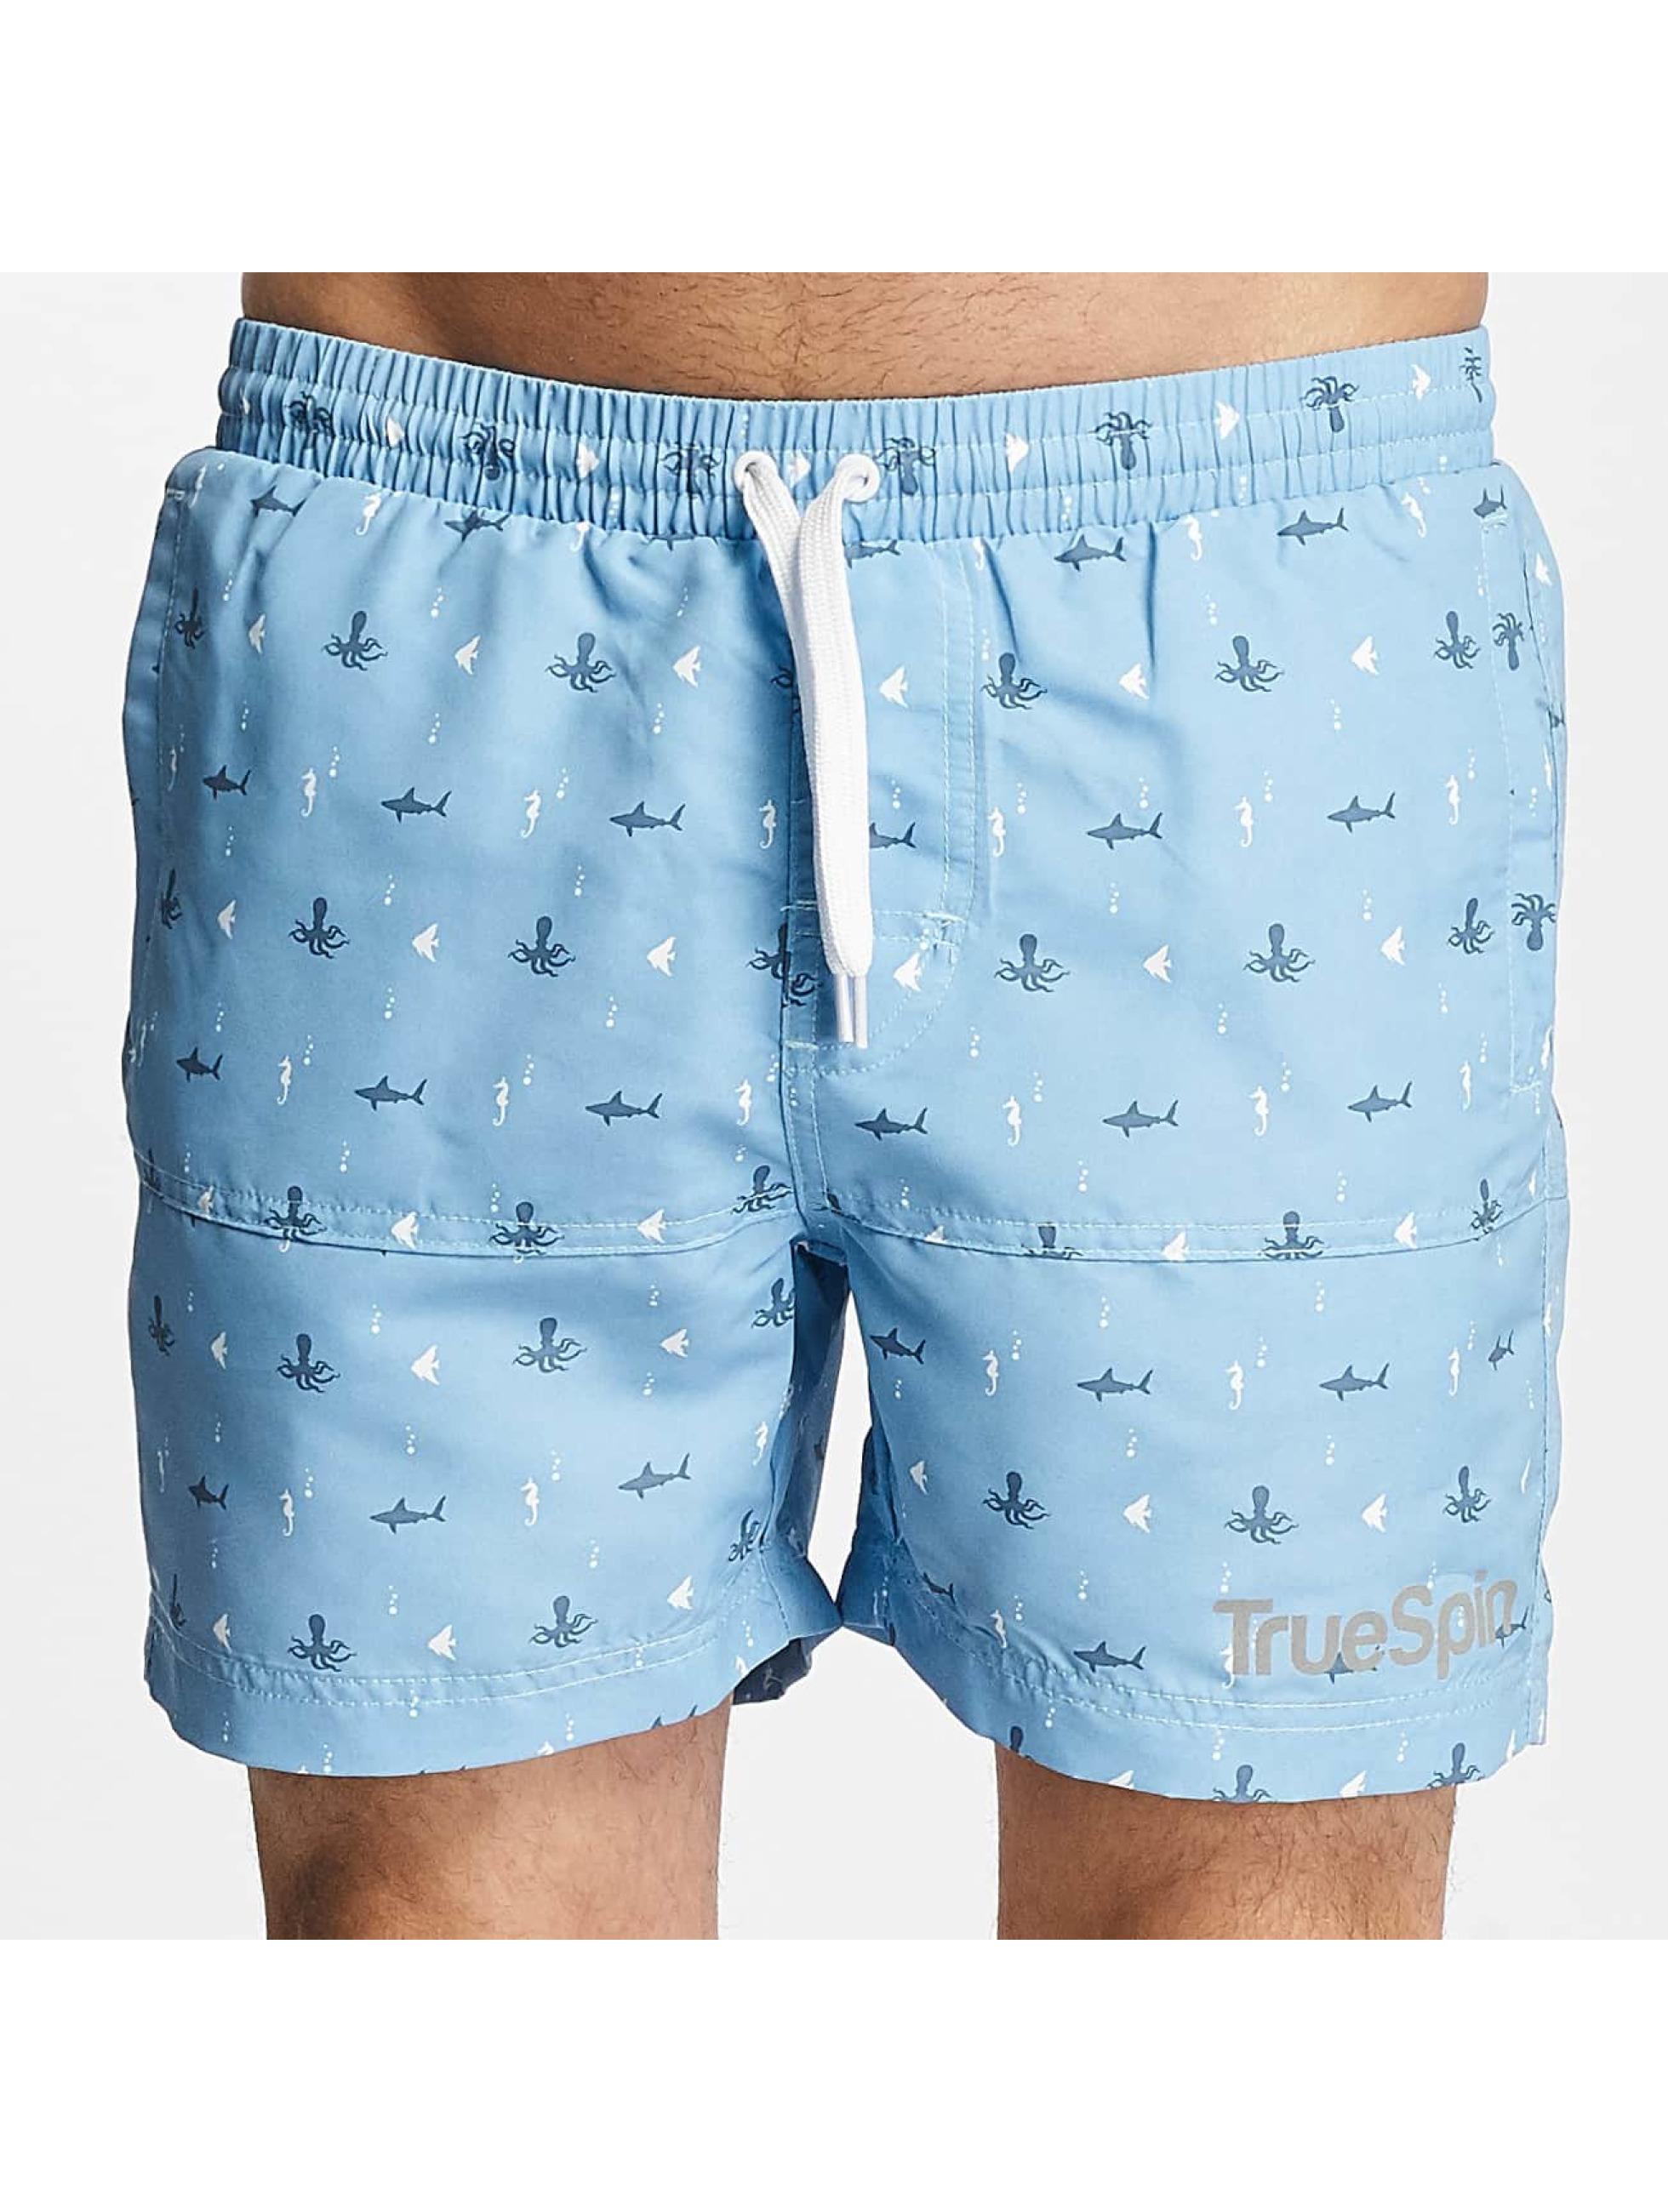 TrueSpin Kąpielówki Underwater Print niebieski